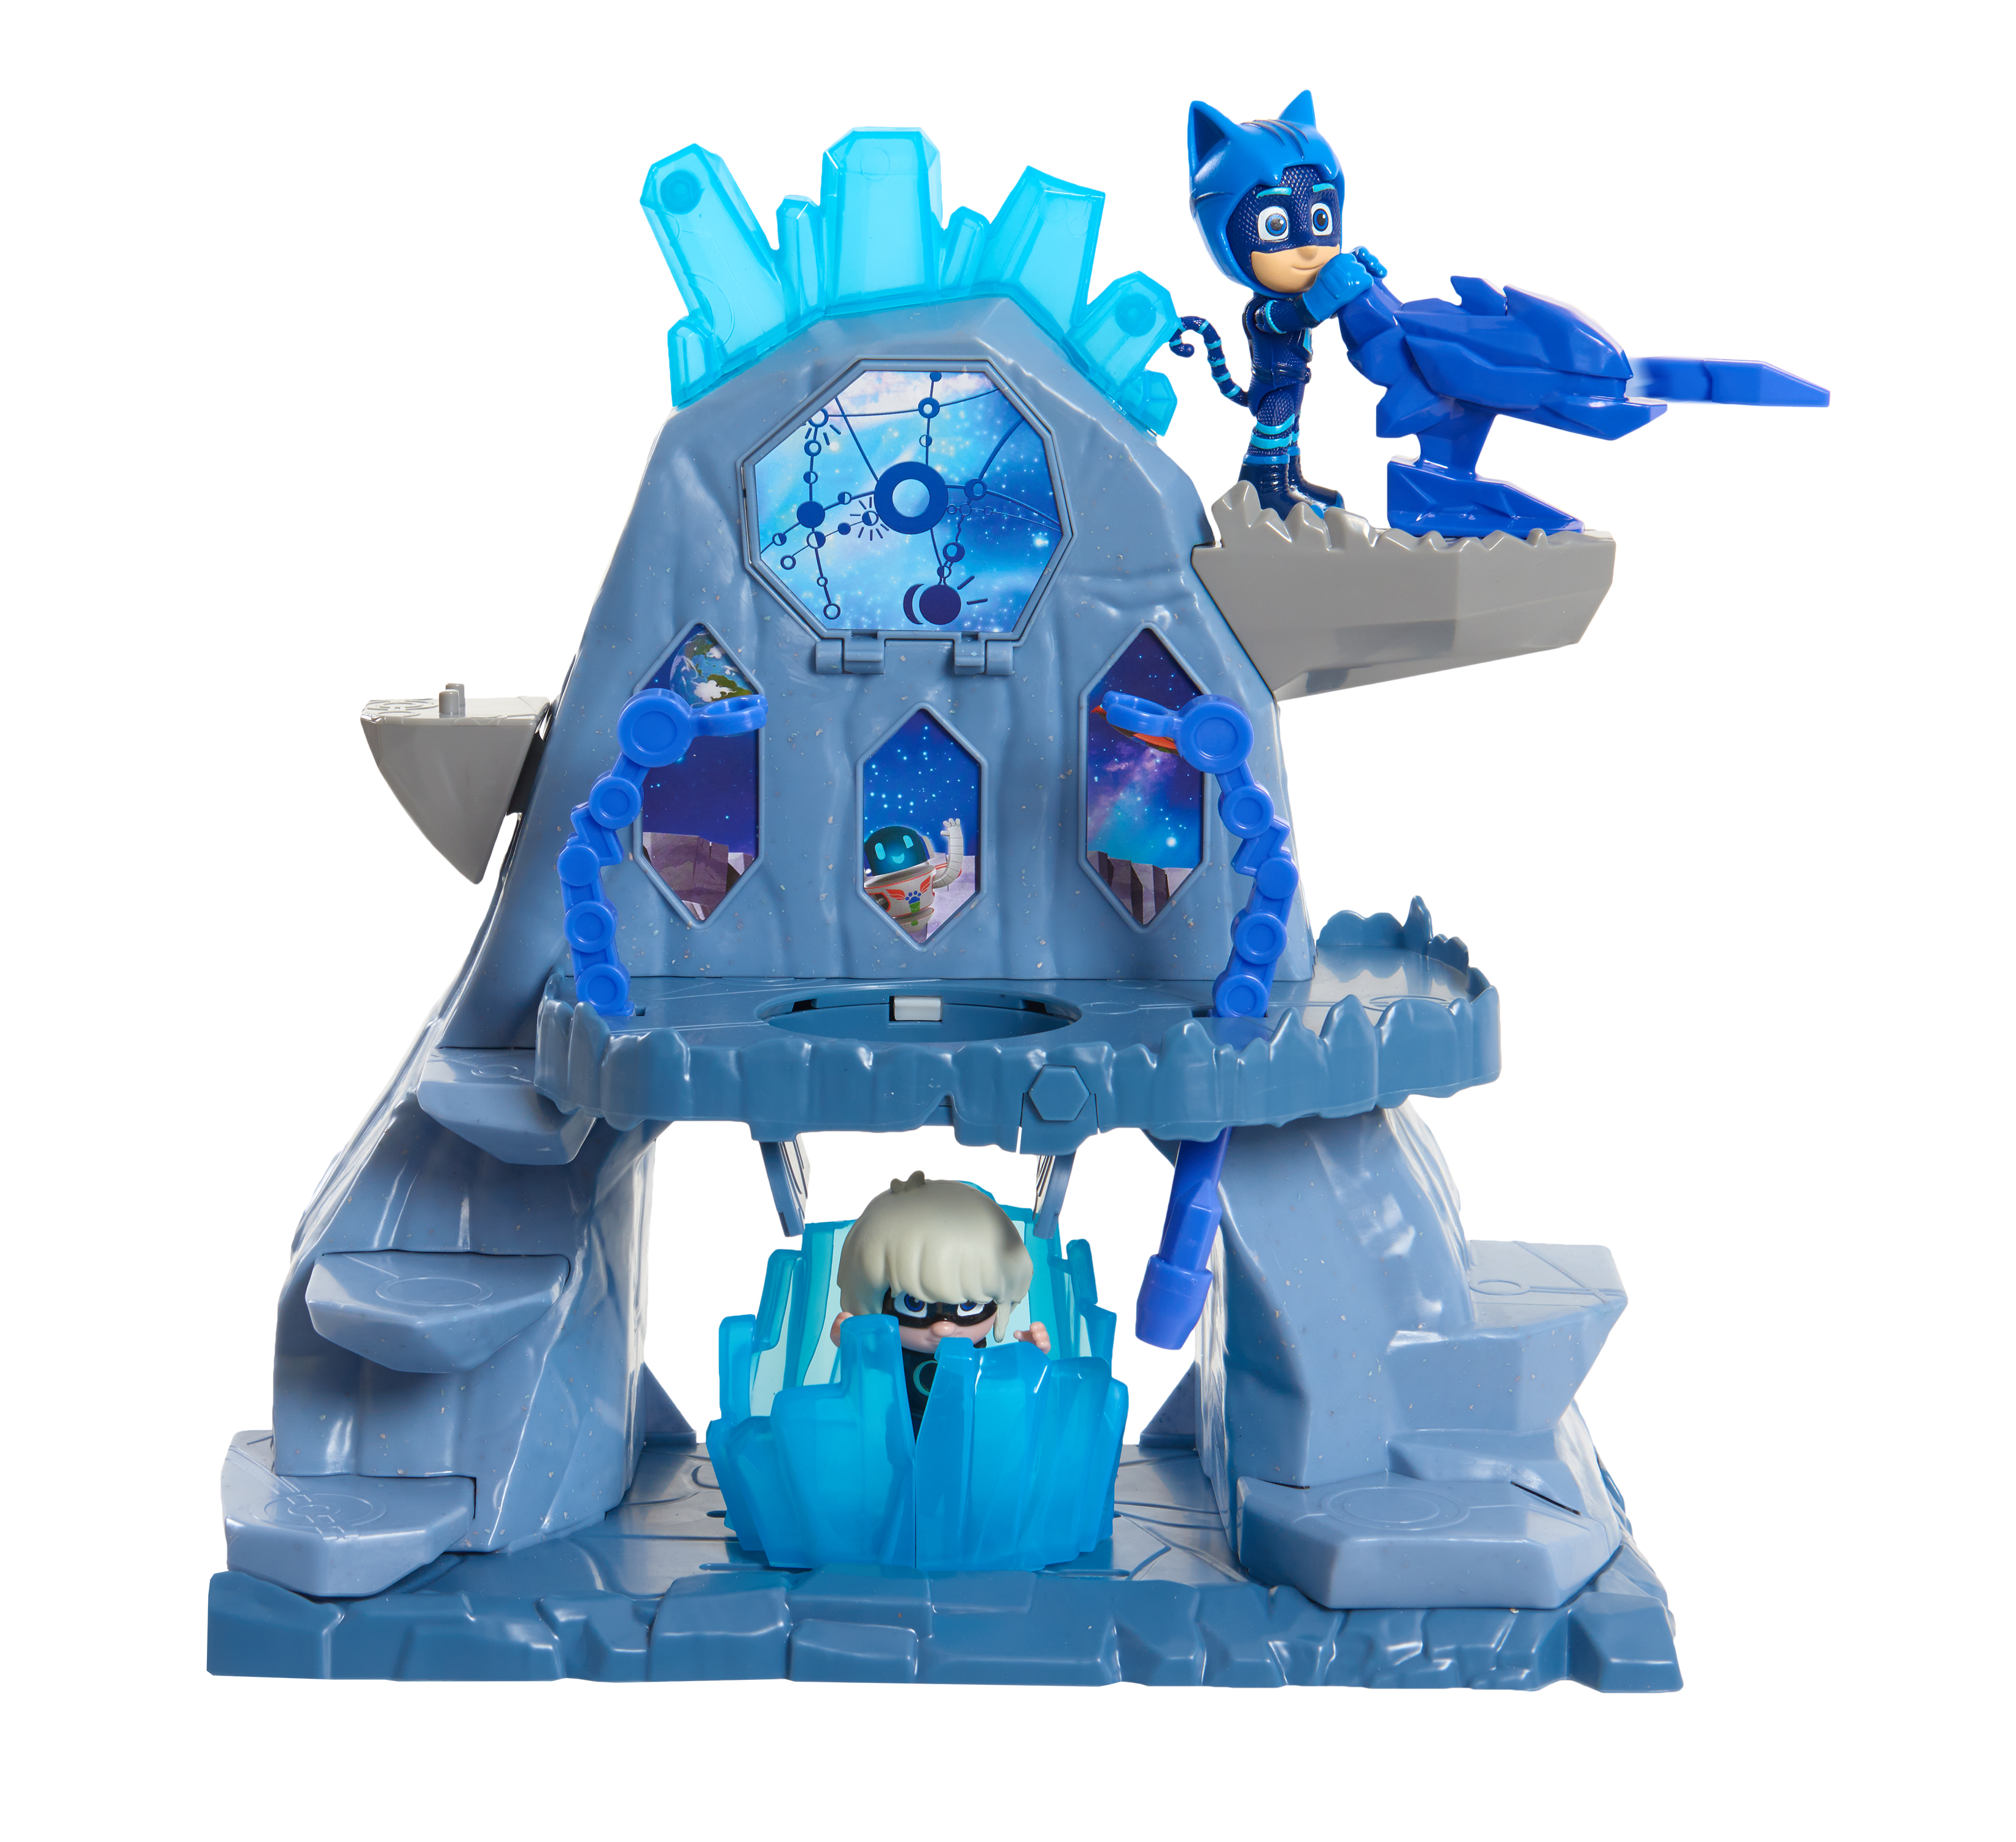 PJ Masks Super Moon Adventure Fortress Playset, Catboy & Luna Girl Figure Included